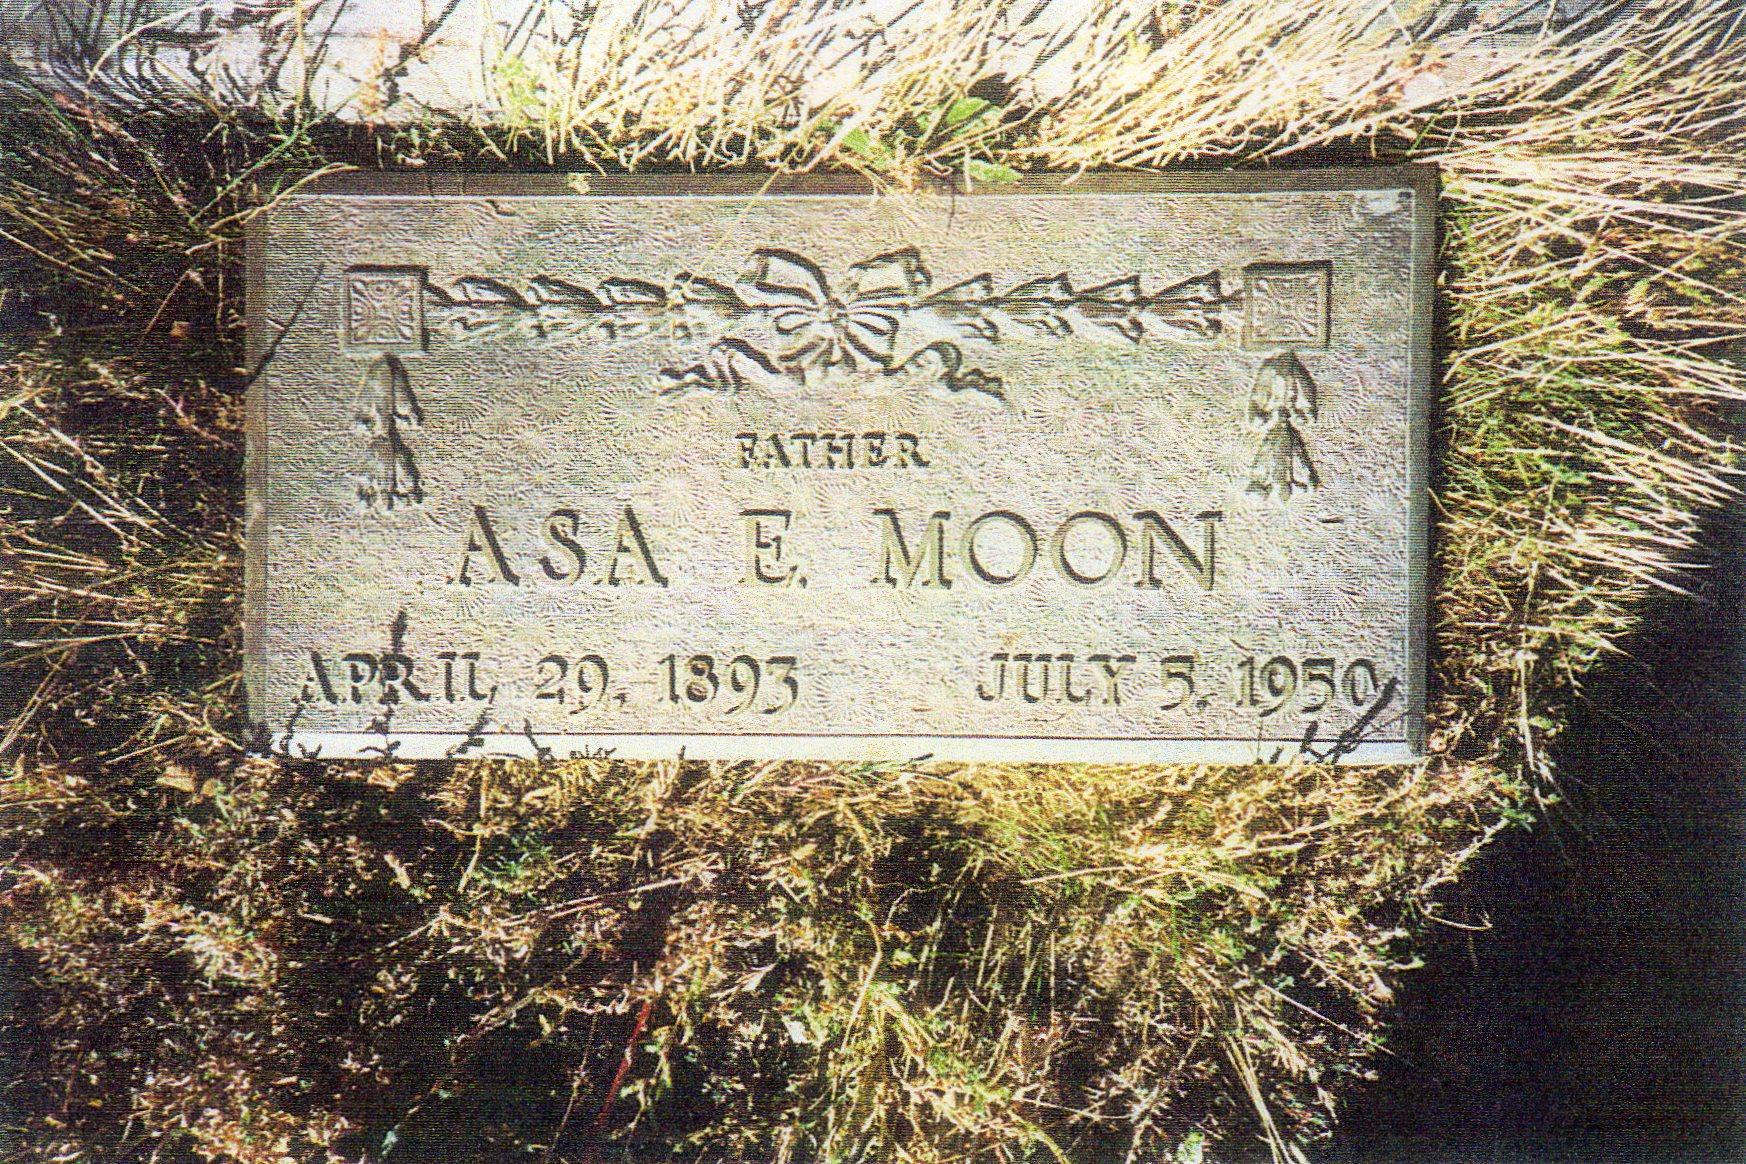 Asa Moon